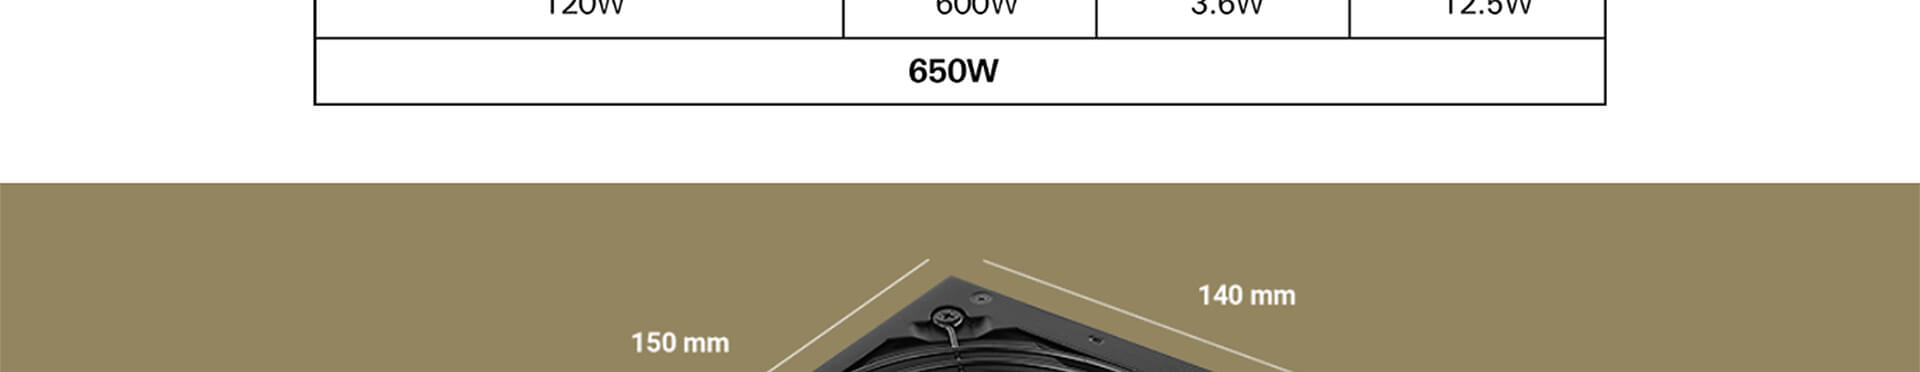 NeoECO-Modular-650-V2---antec_28.jpg